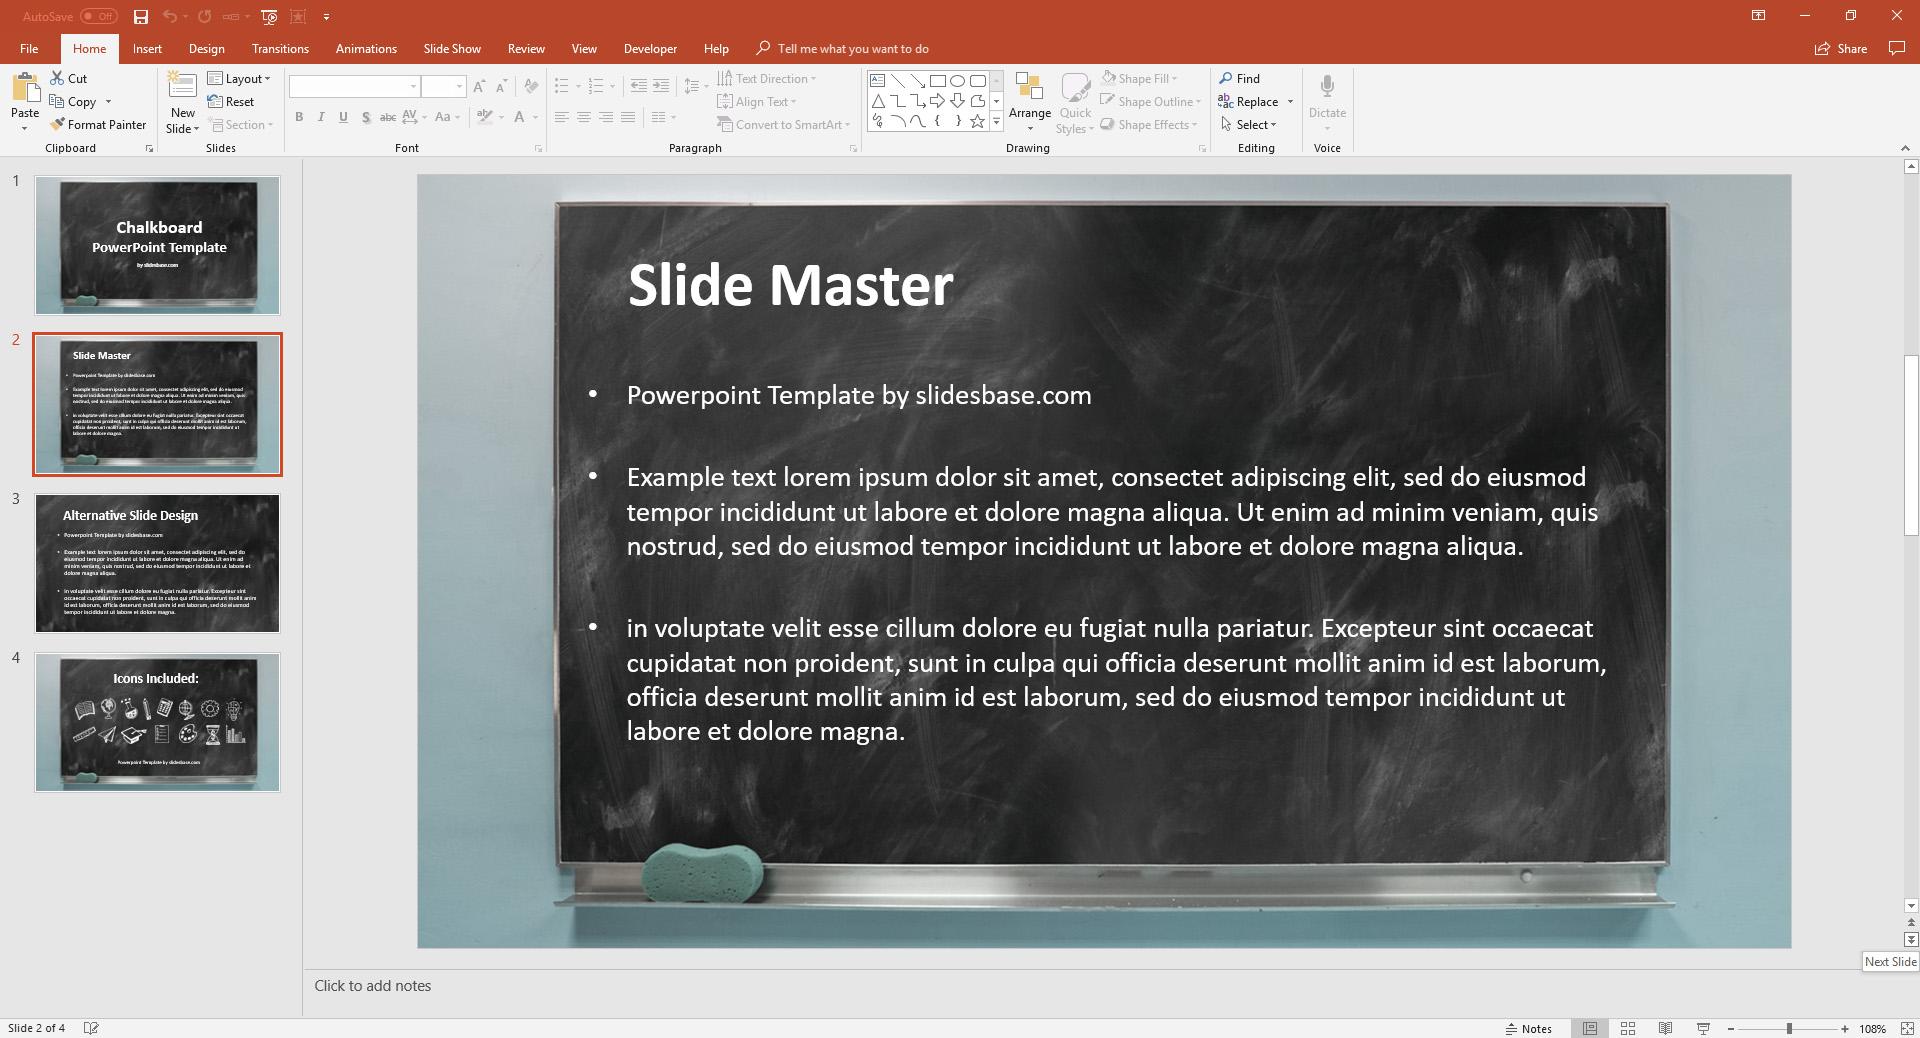 blackboard-chalkboard-ppt-powerpoint-template-presentation-for-prezi-next